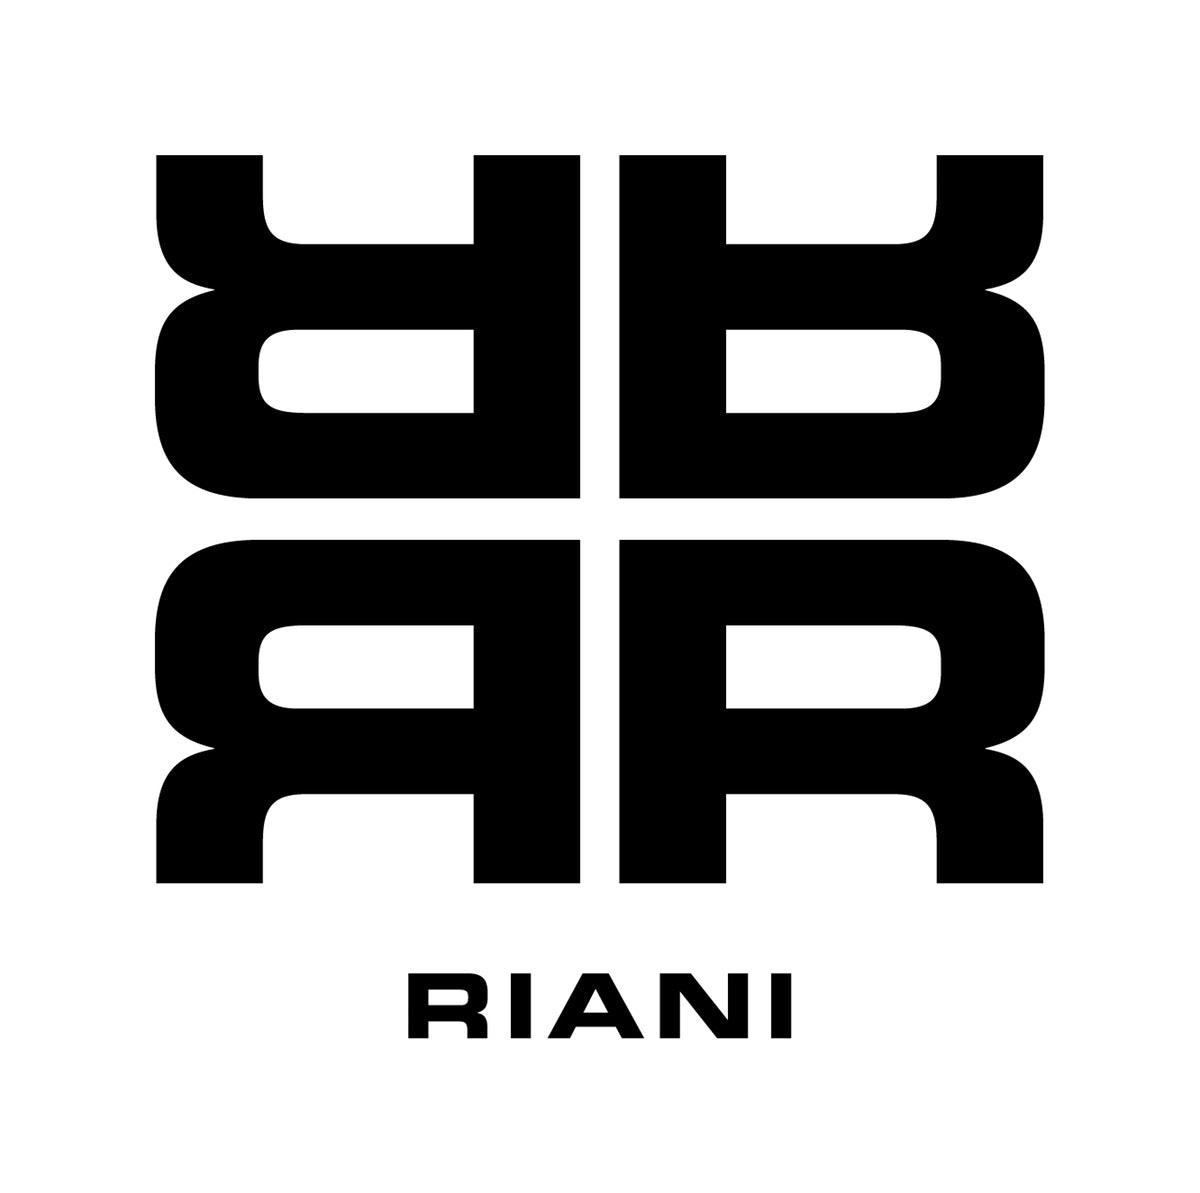 Logo 2 - RIANI